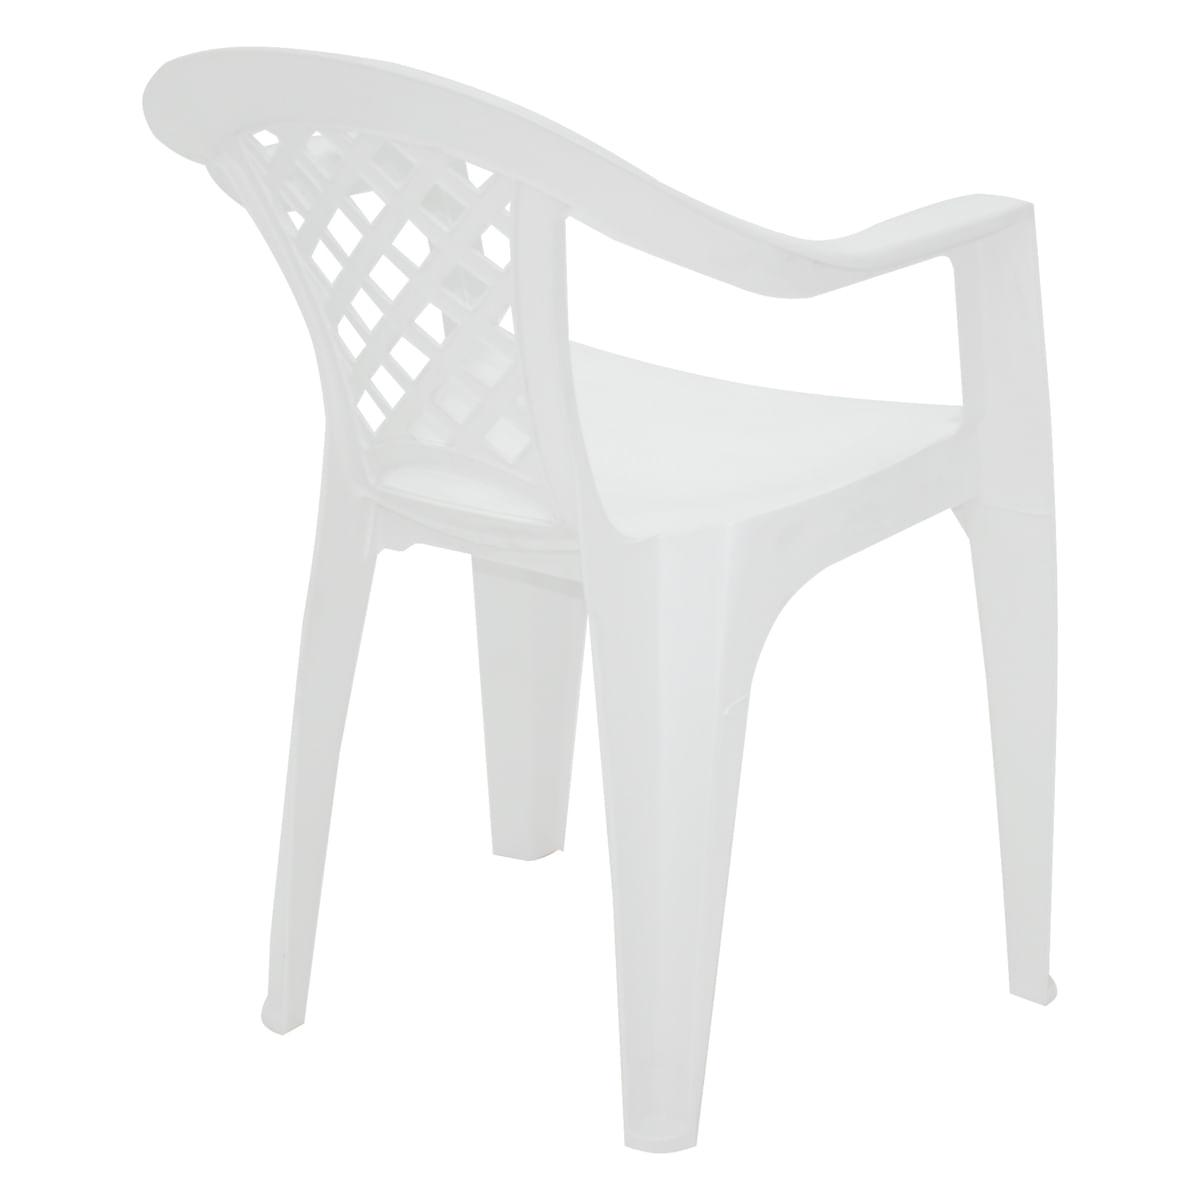 Cadeira Tramontina Iguape em Polipropileno Branco